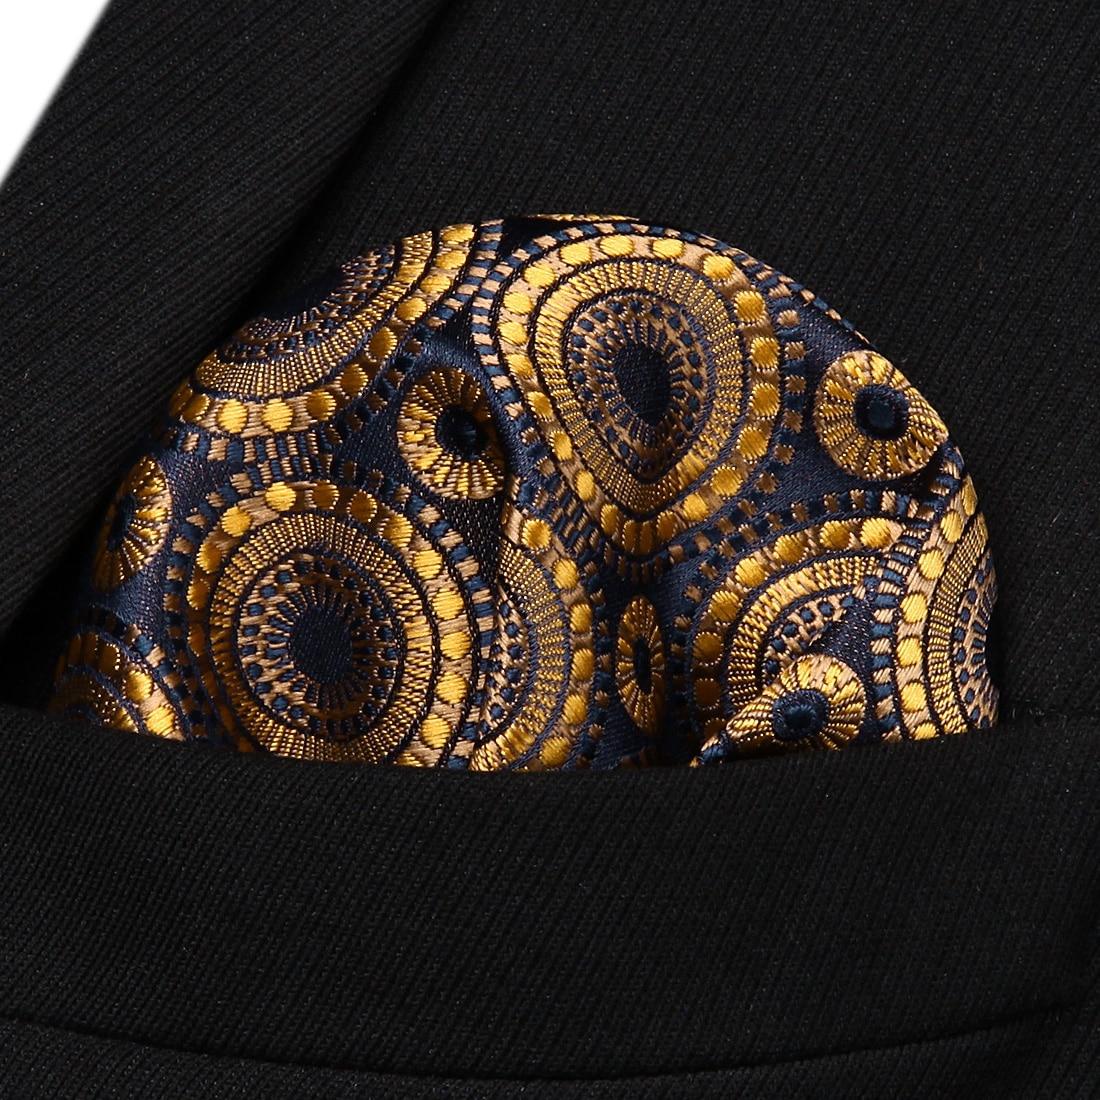 HF804D Gold Navy Blue Floral Men Silk Party Handkerchief Pocket Square Hanky